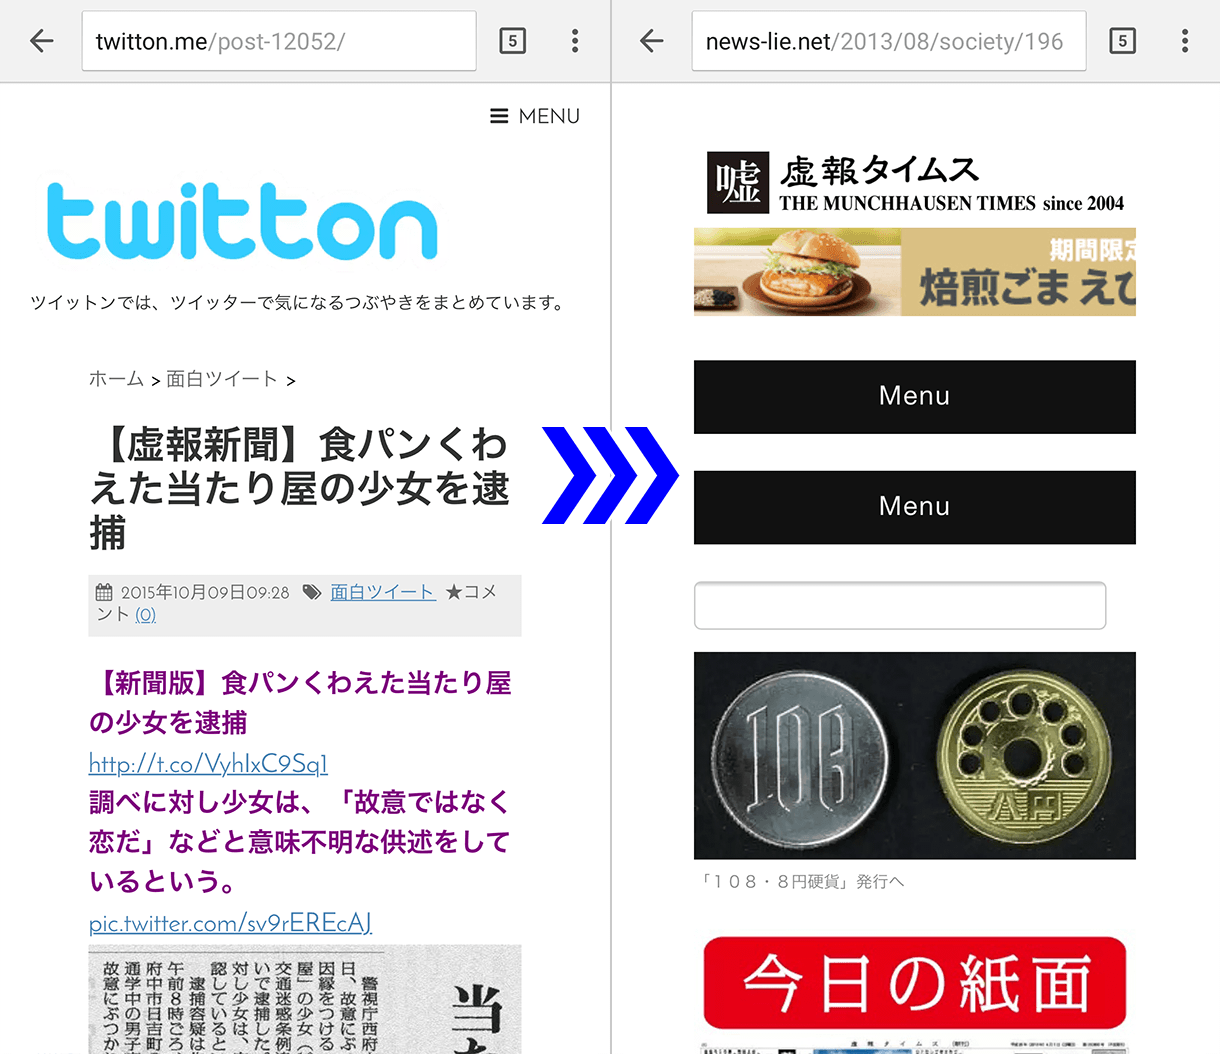 IMG 20151012 005